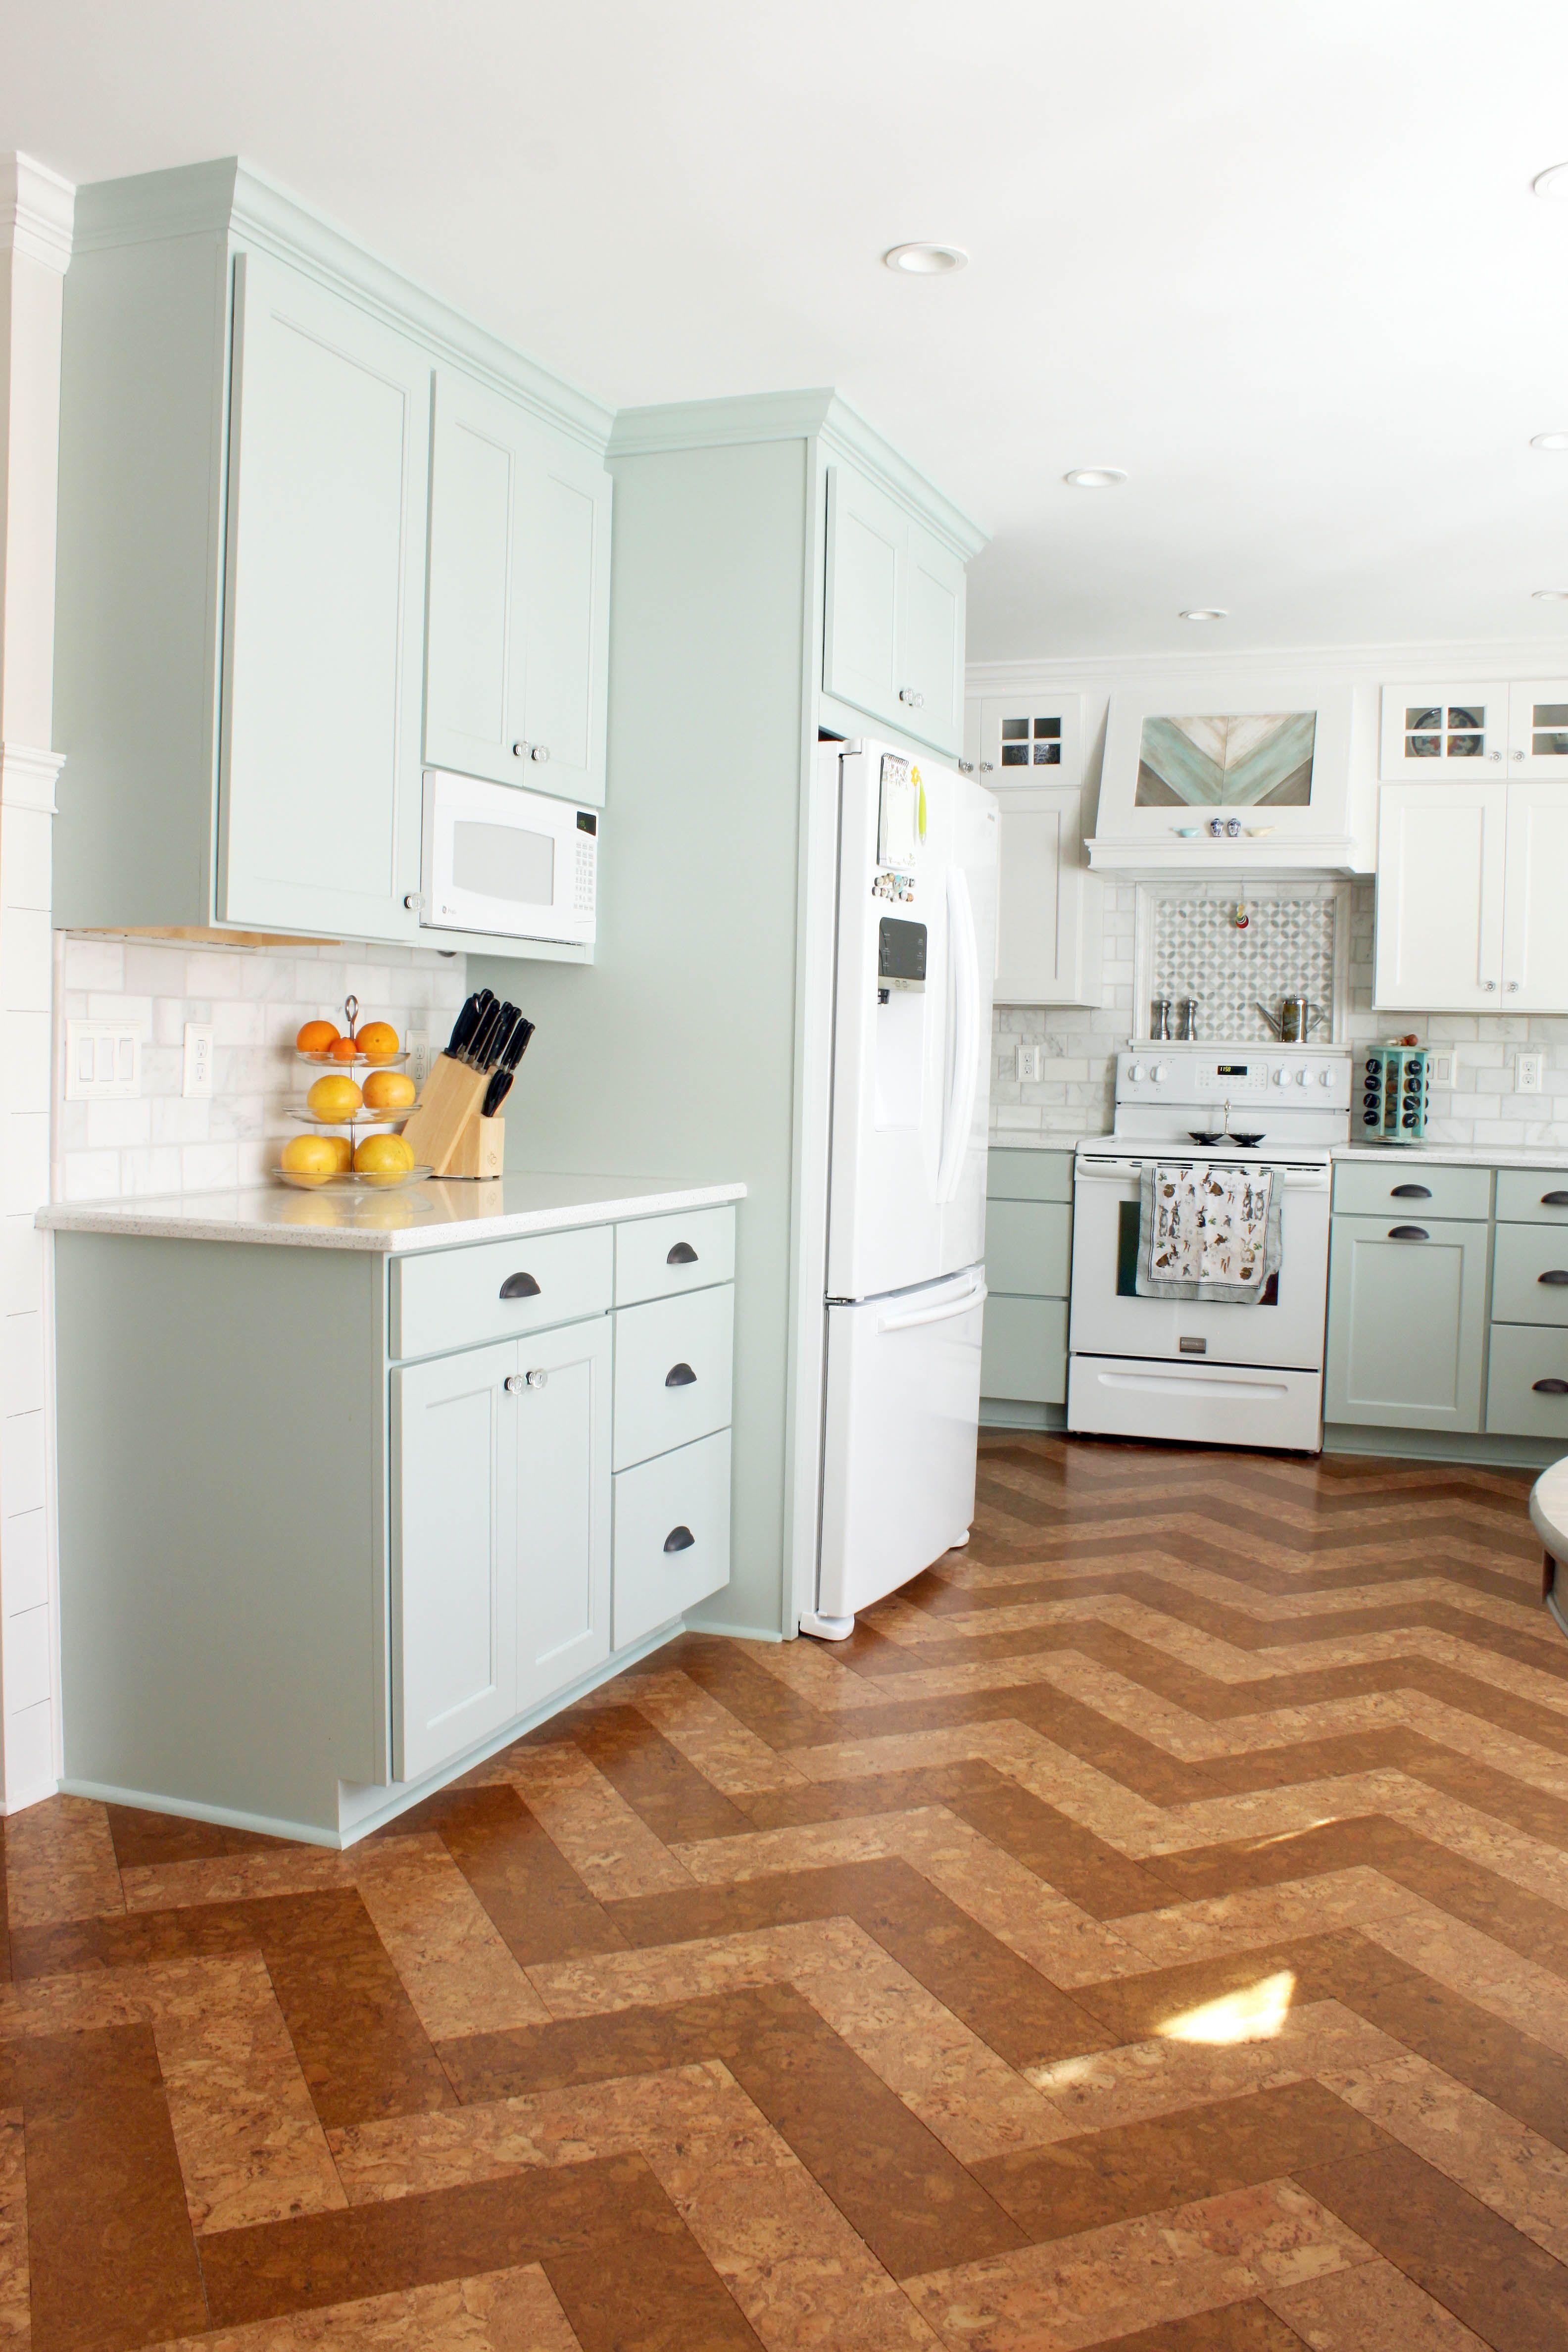 A Herringbone Cork Floor Made By Globus Cork Selected And